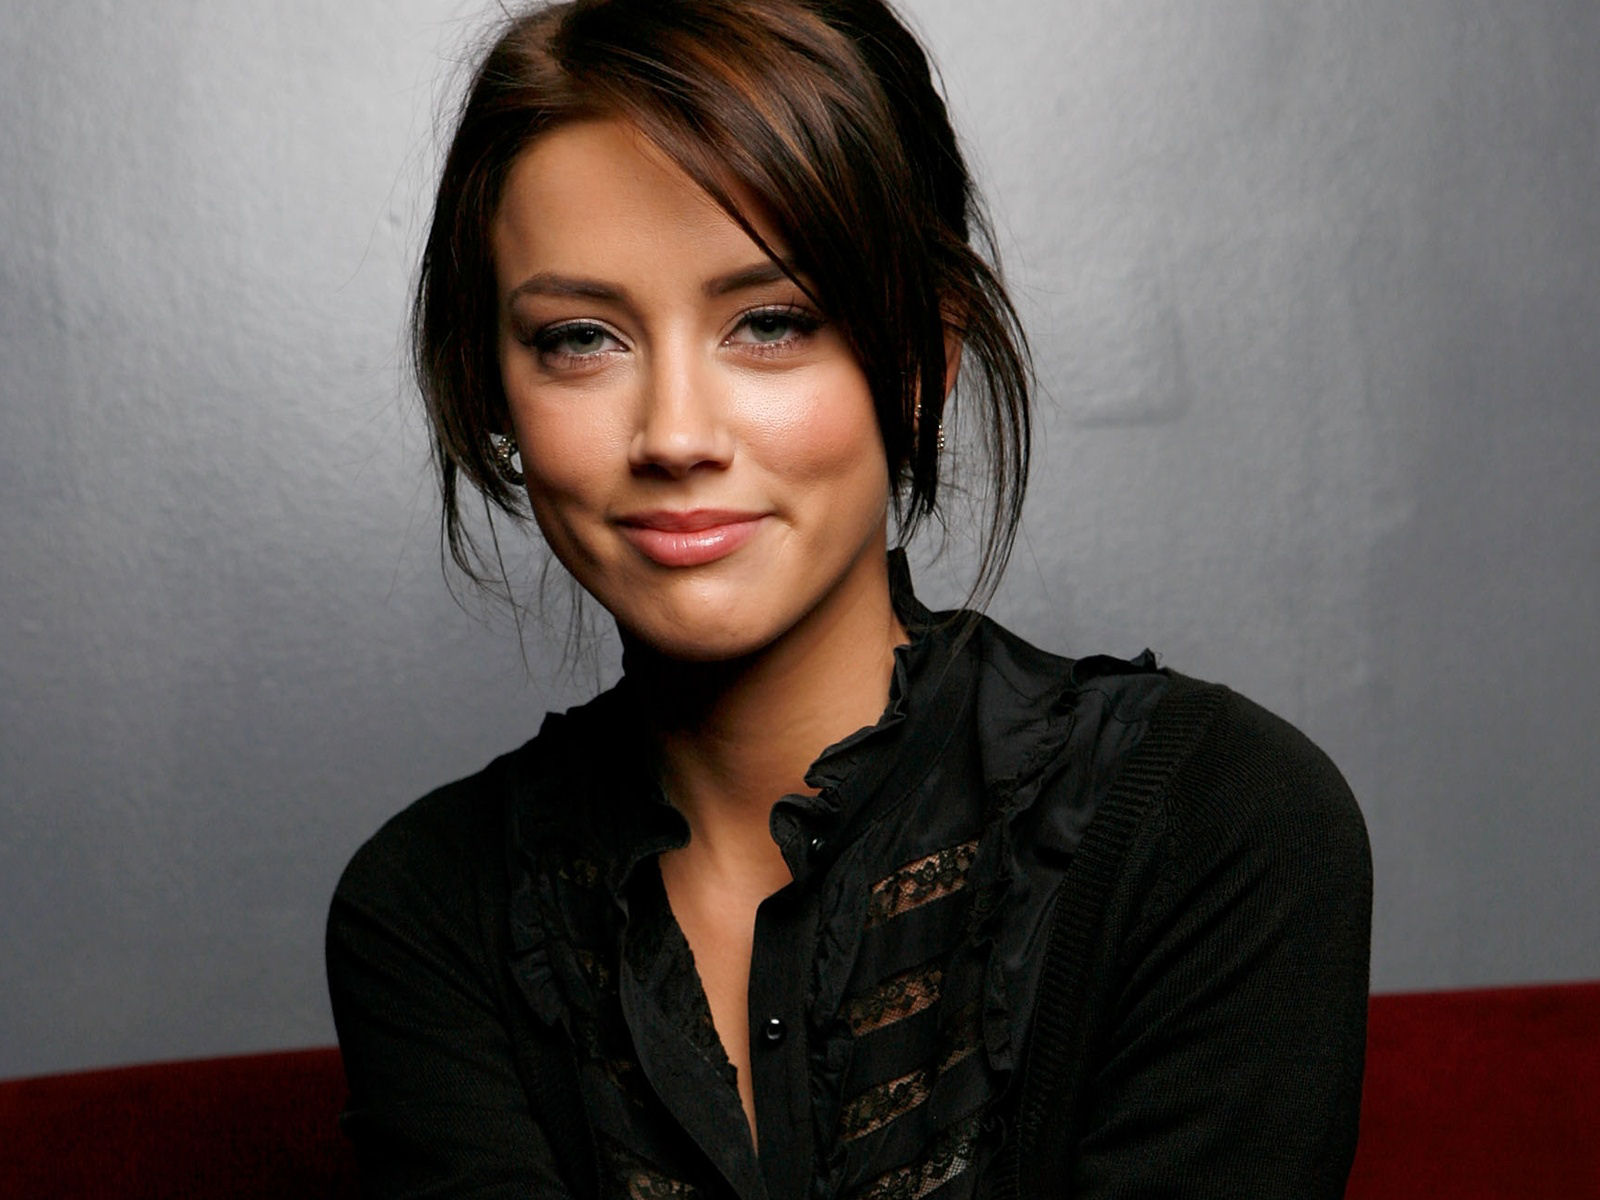 Amber Heard | Эмбер Хёрд - Страница 2 Amber-Heard-Wallpaper-005-1600x1200